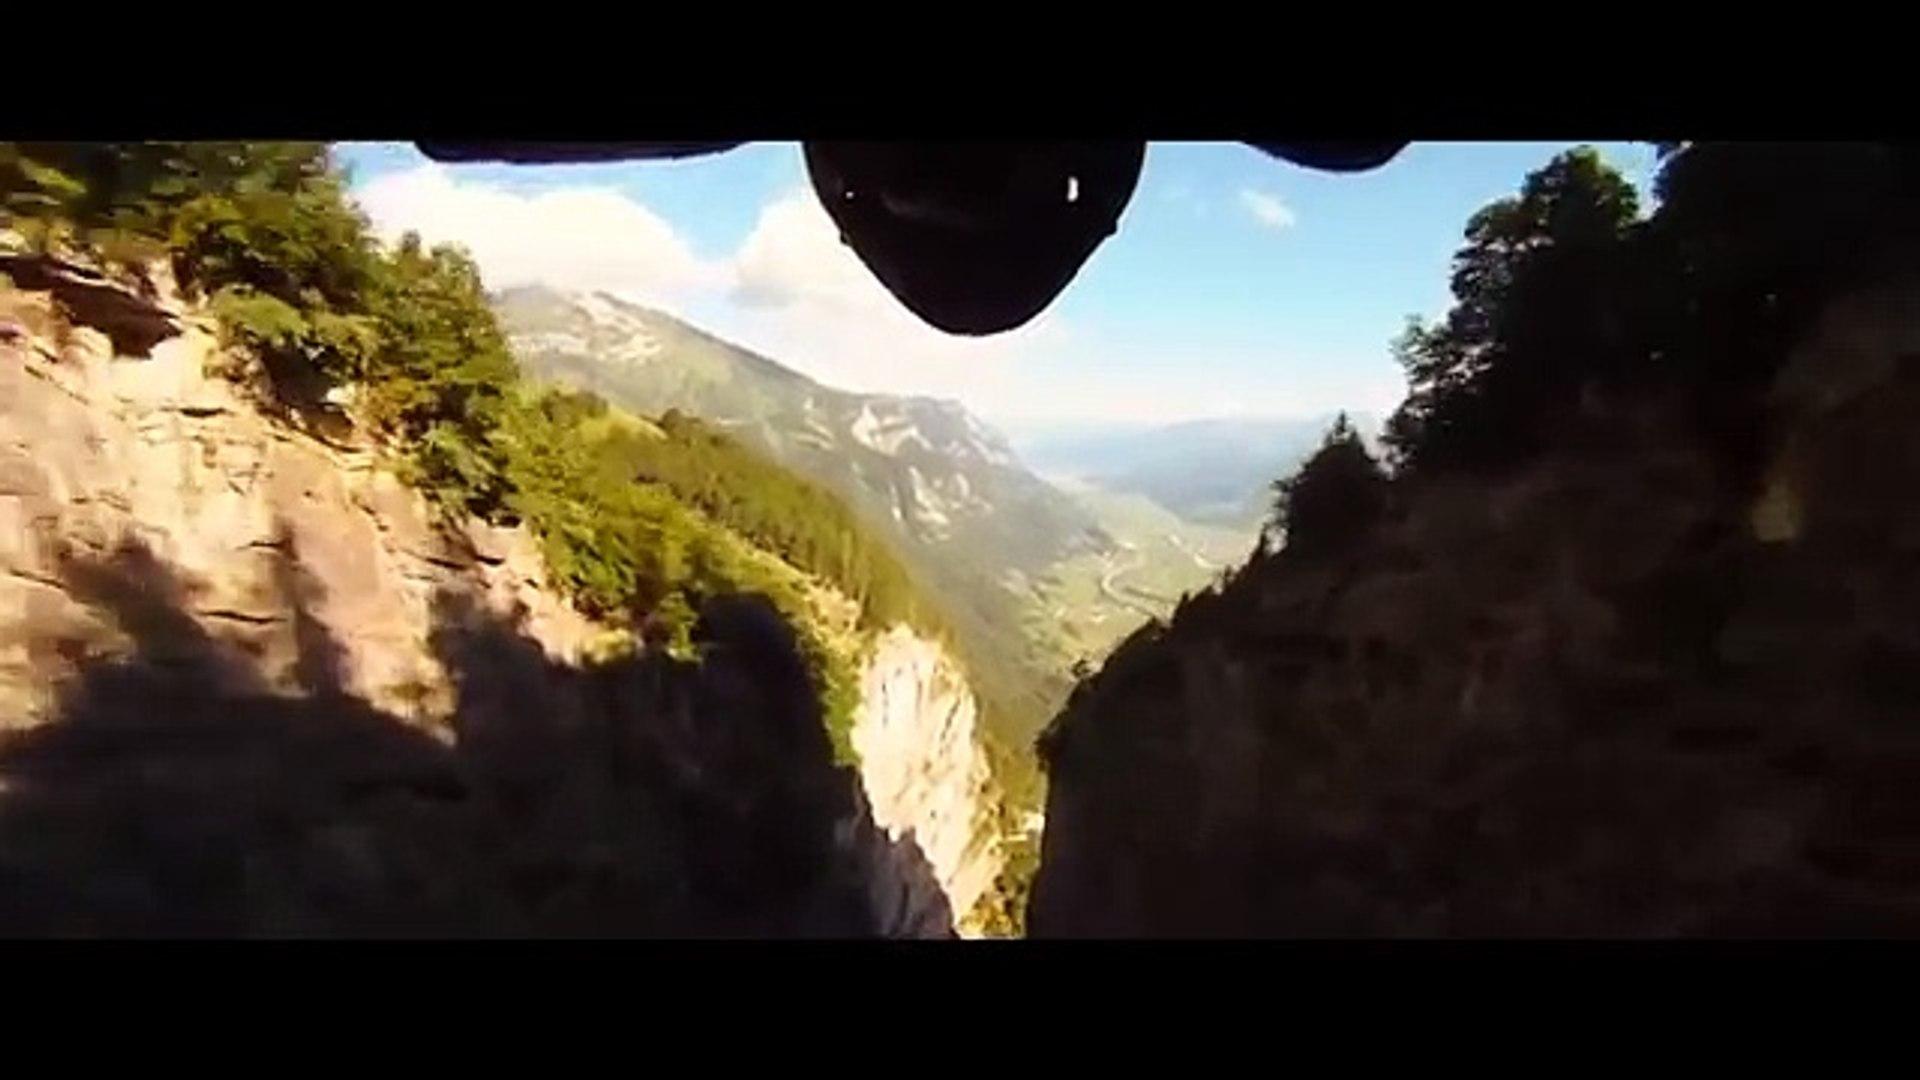 JOURNEY - Motivational Video